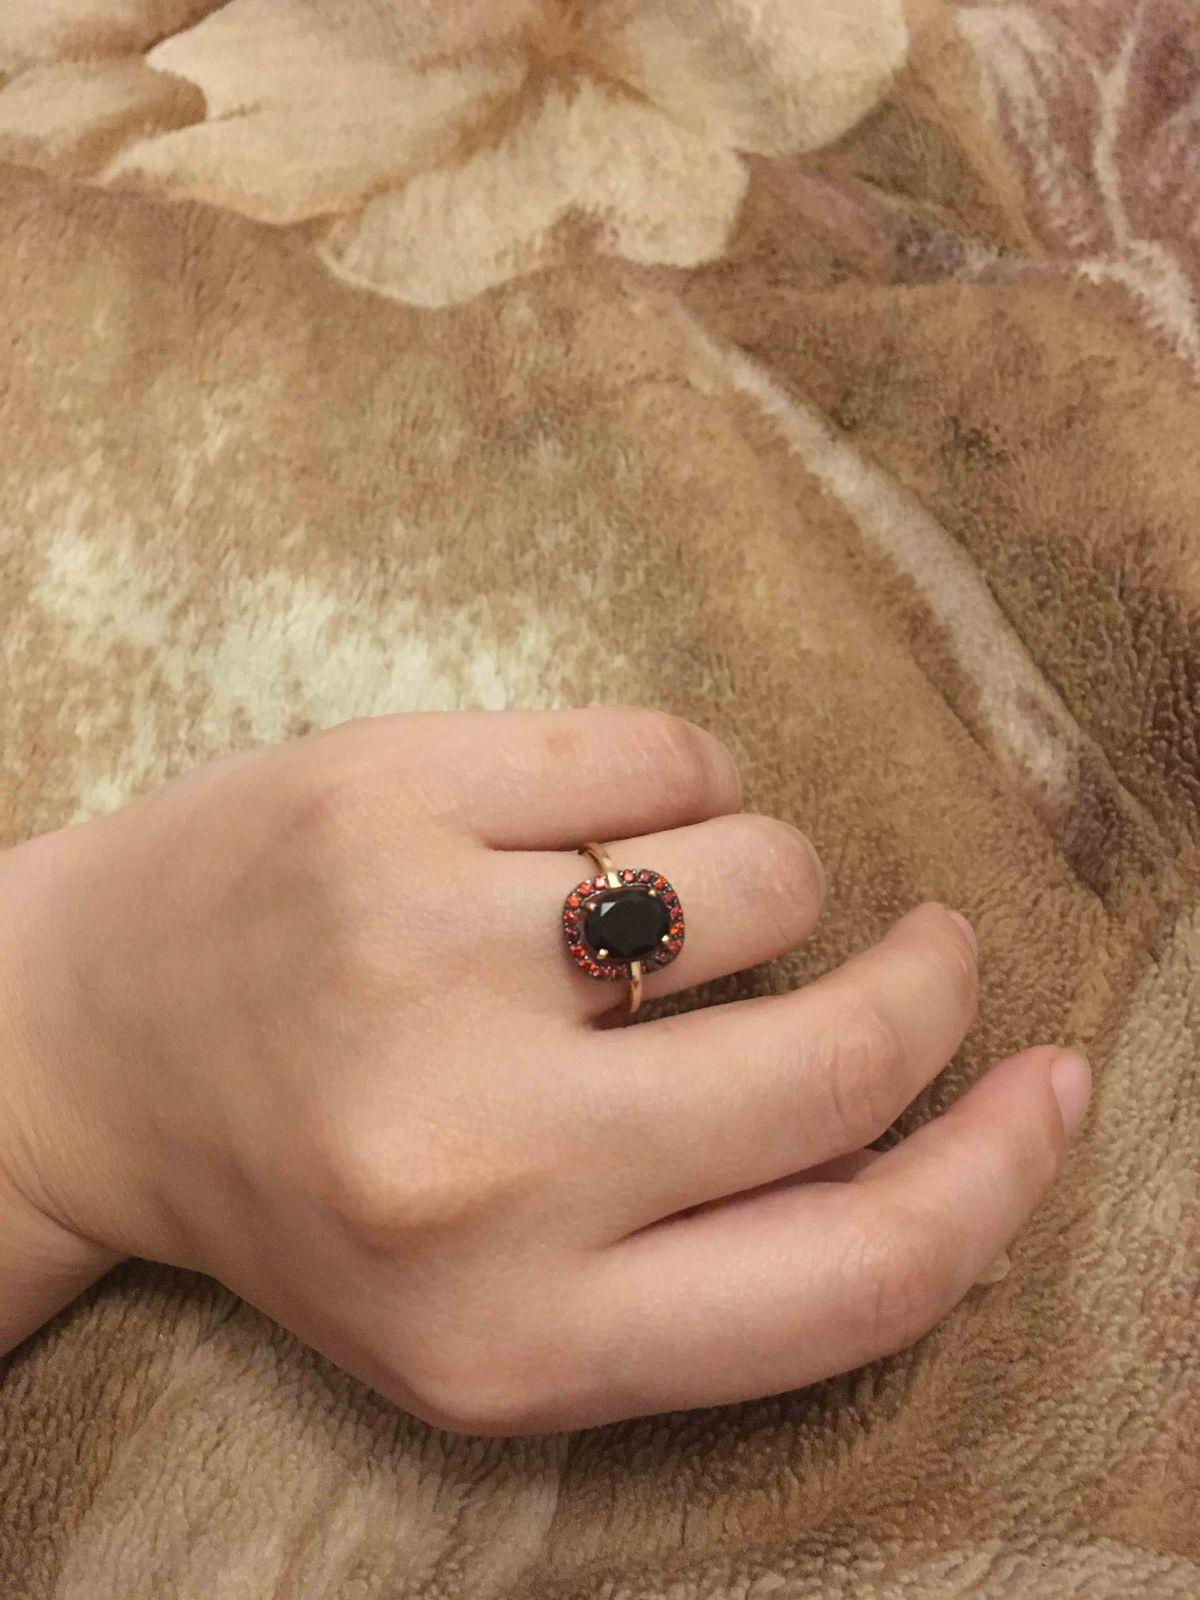 Кольцо от мужа)